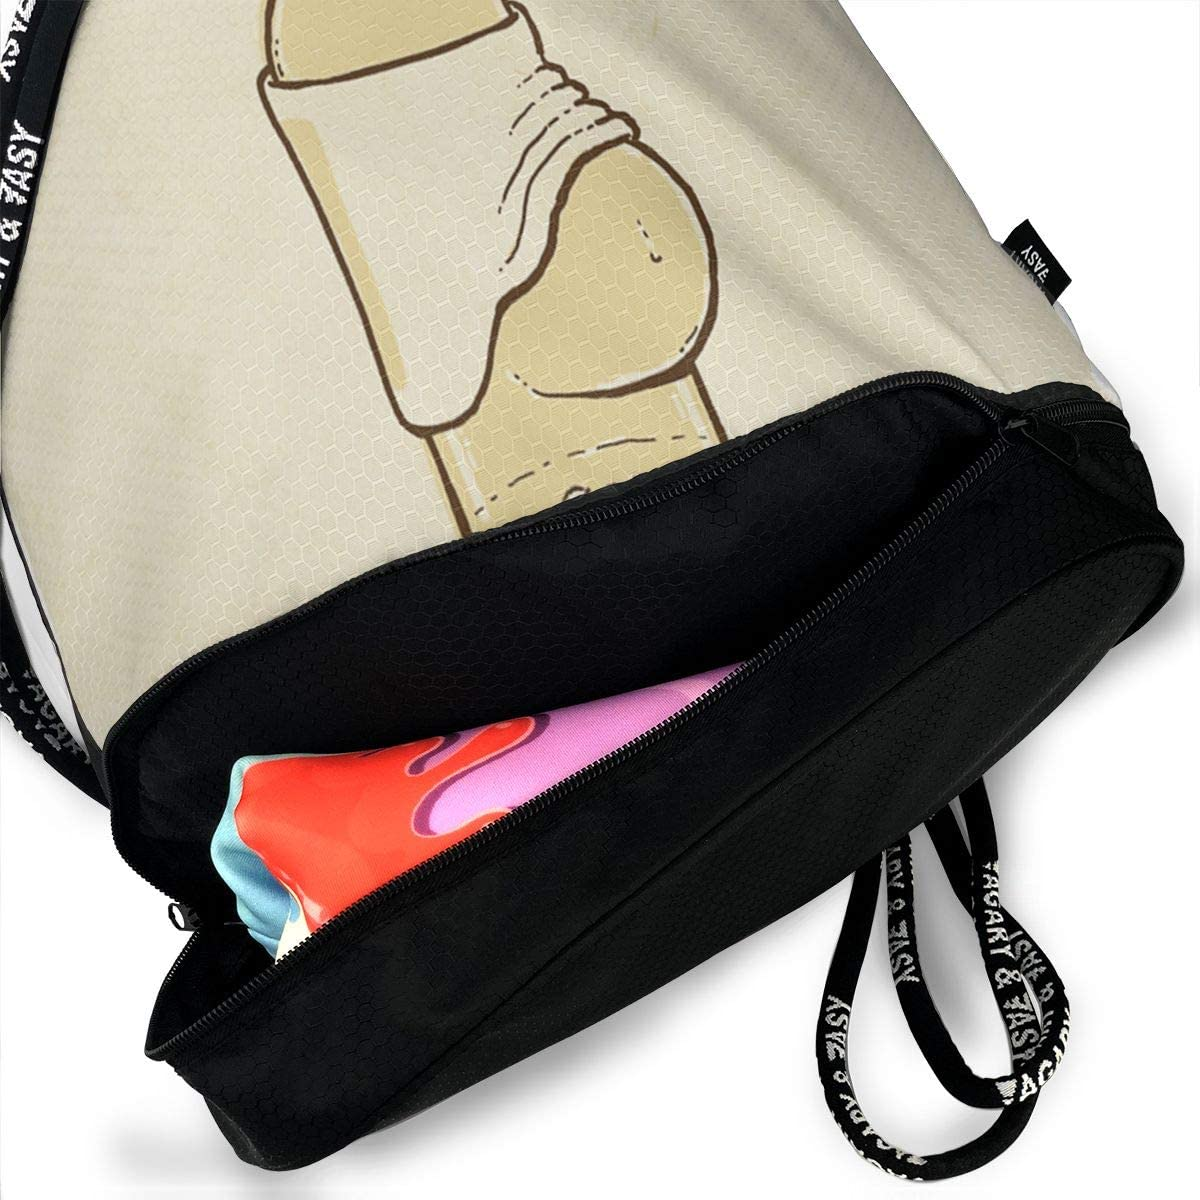 Fashion Outdoor Zipper Drawstring Bag Funny Beer Printed Bundle Backpack for Men Women Unisex Multi-Function Backpack